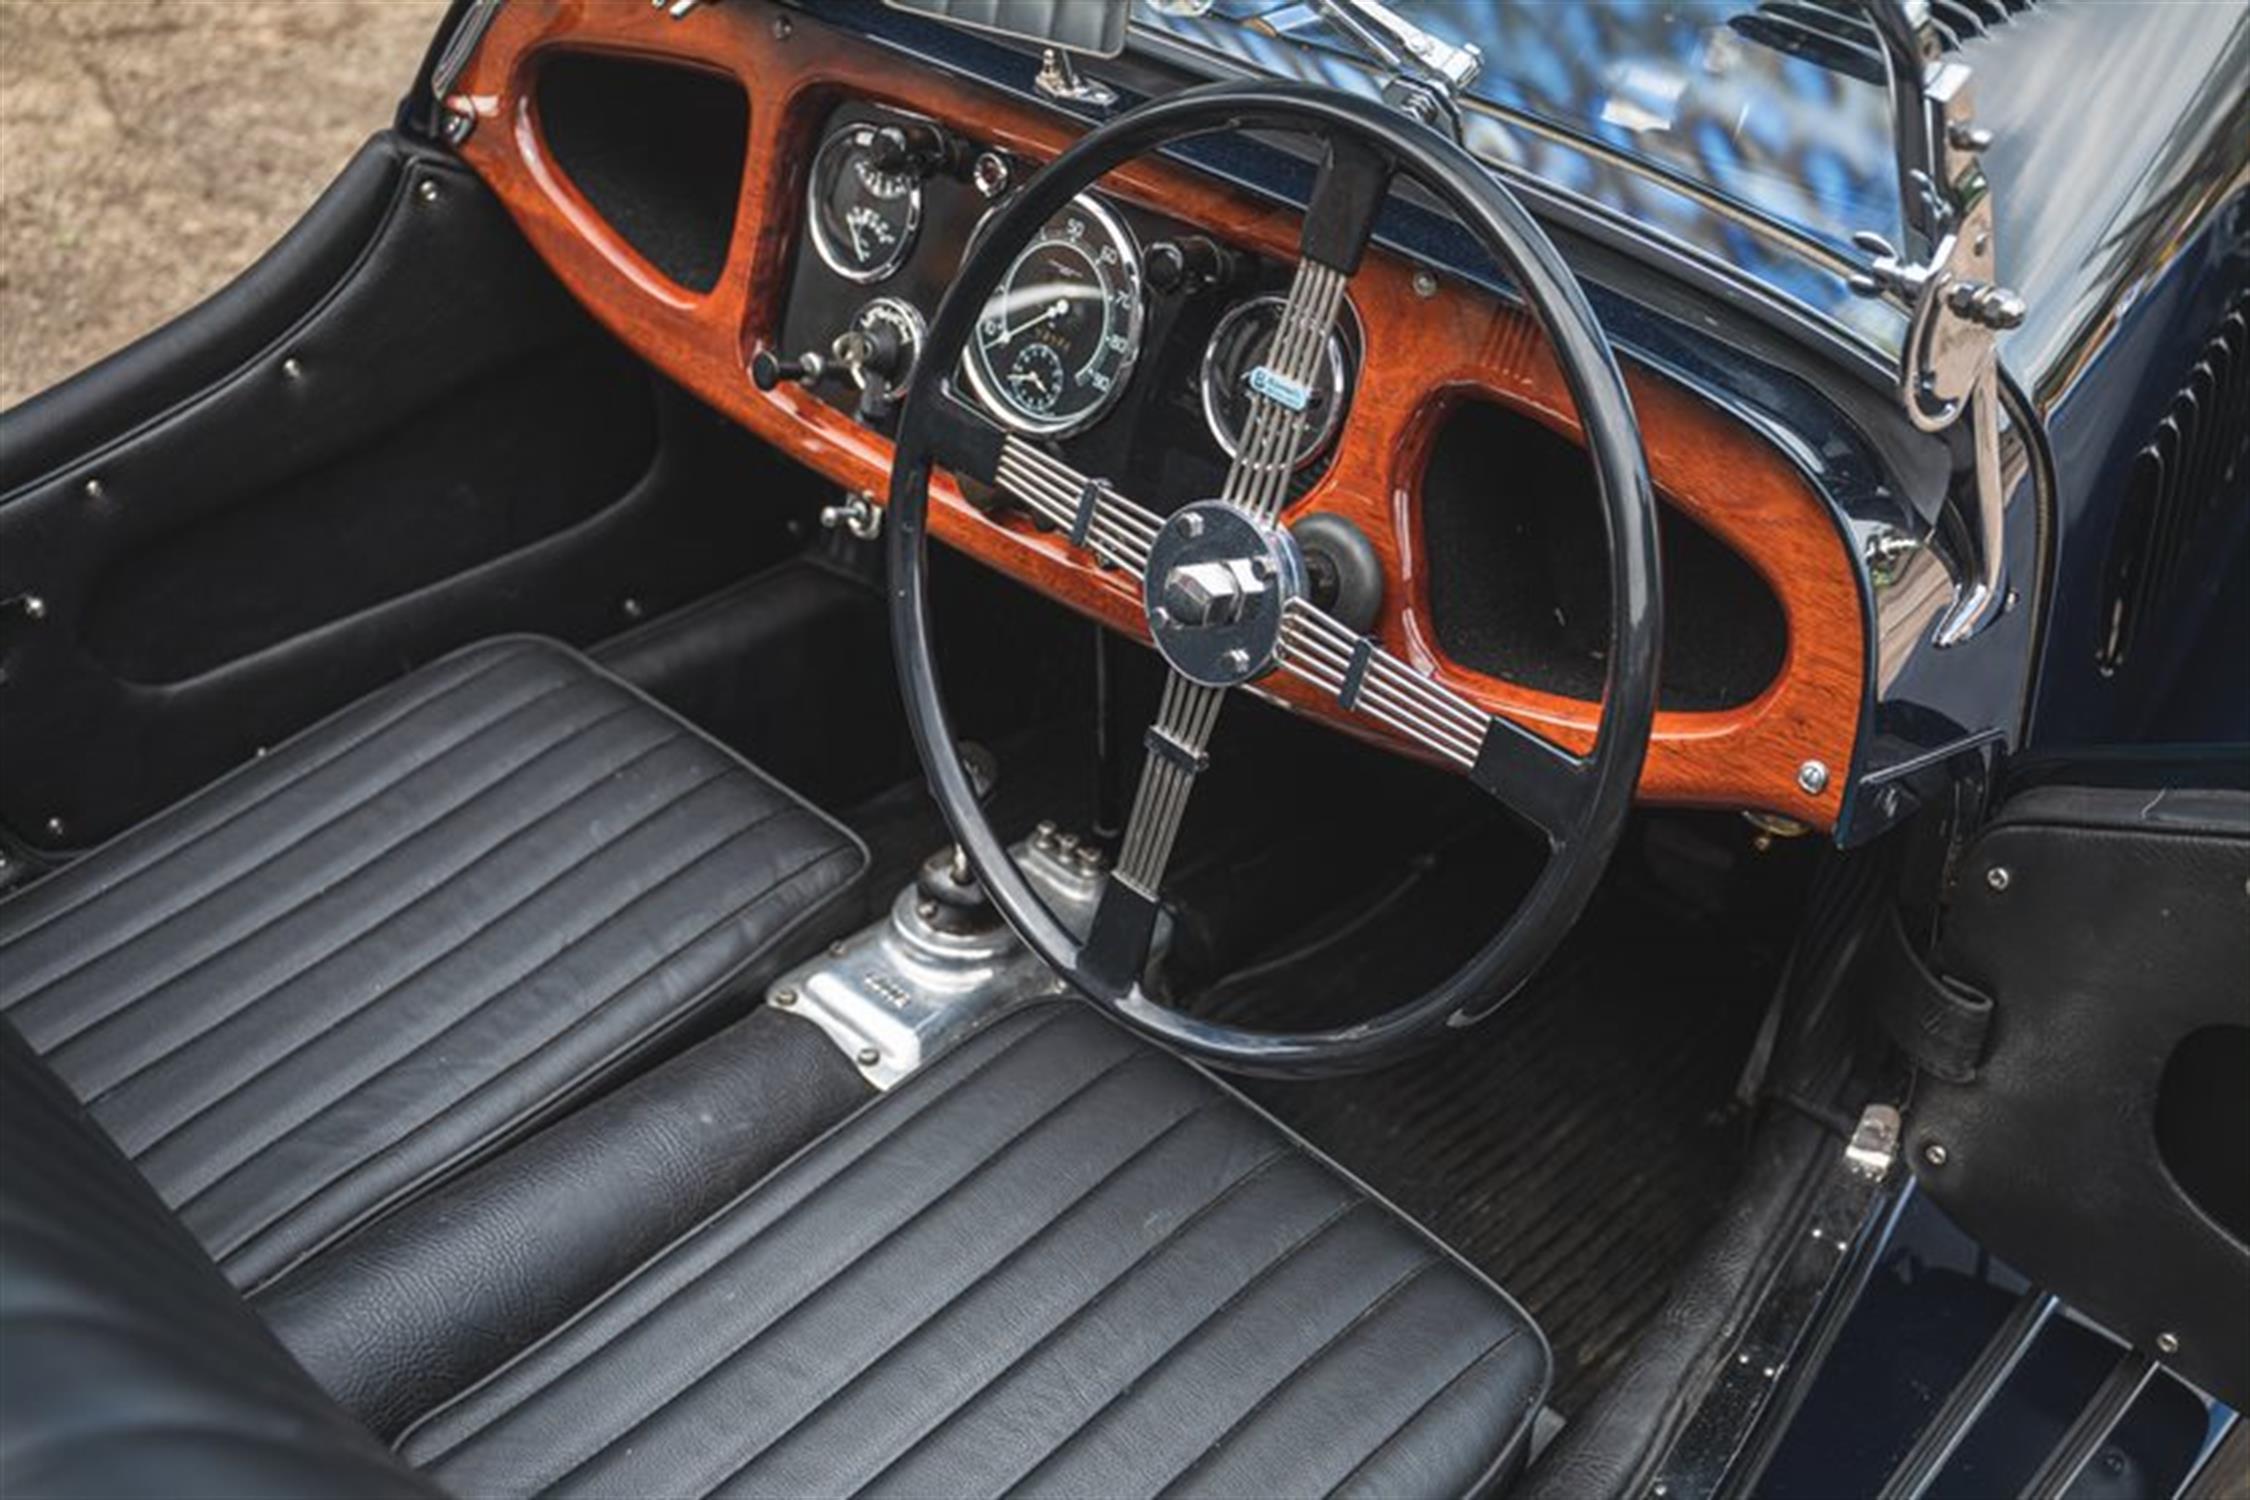 1939 Morgan 4/4 Series 1 'Flat Rad' (1098cc Climax Engine) - Image 3 of 10